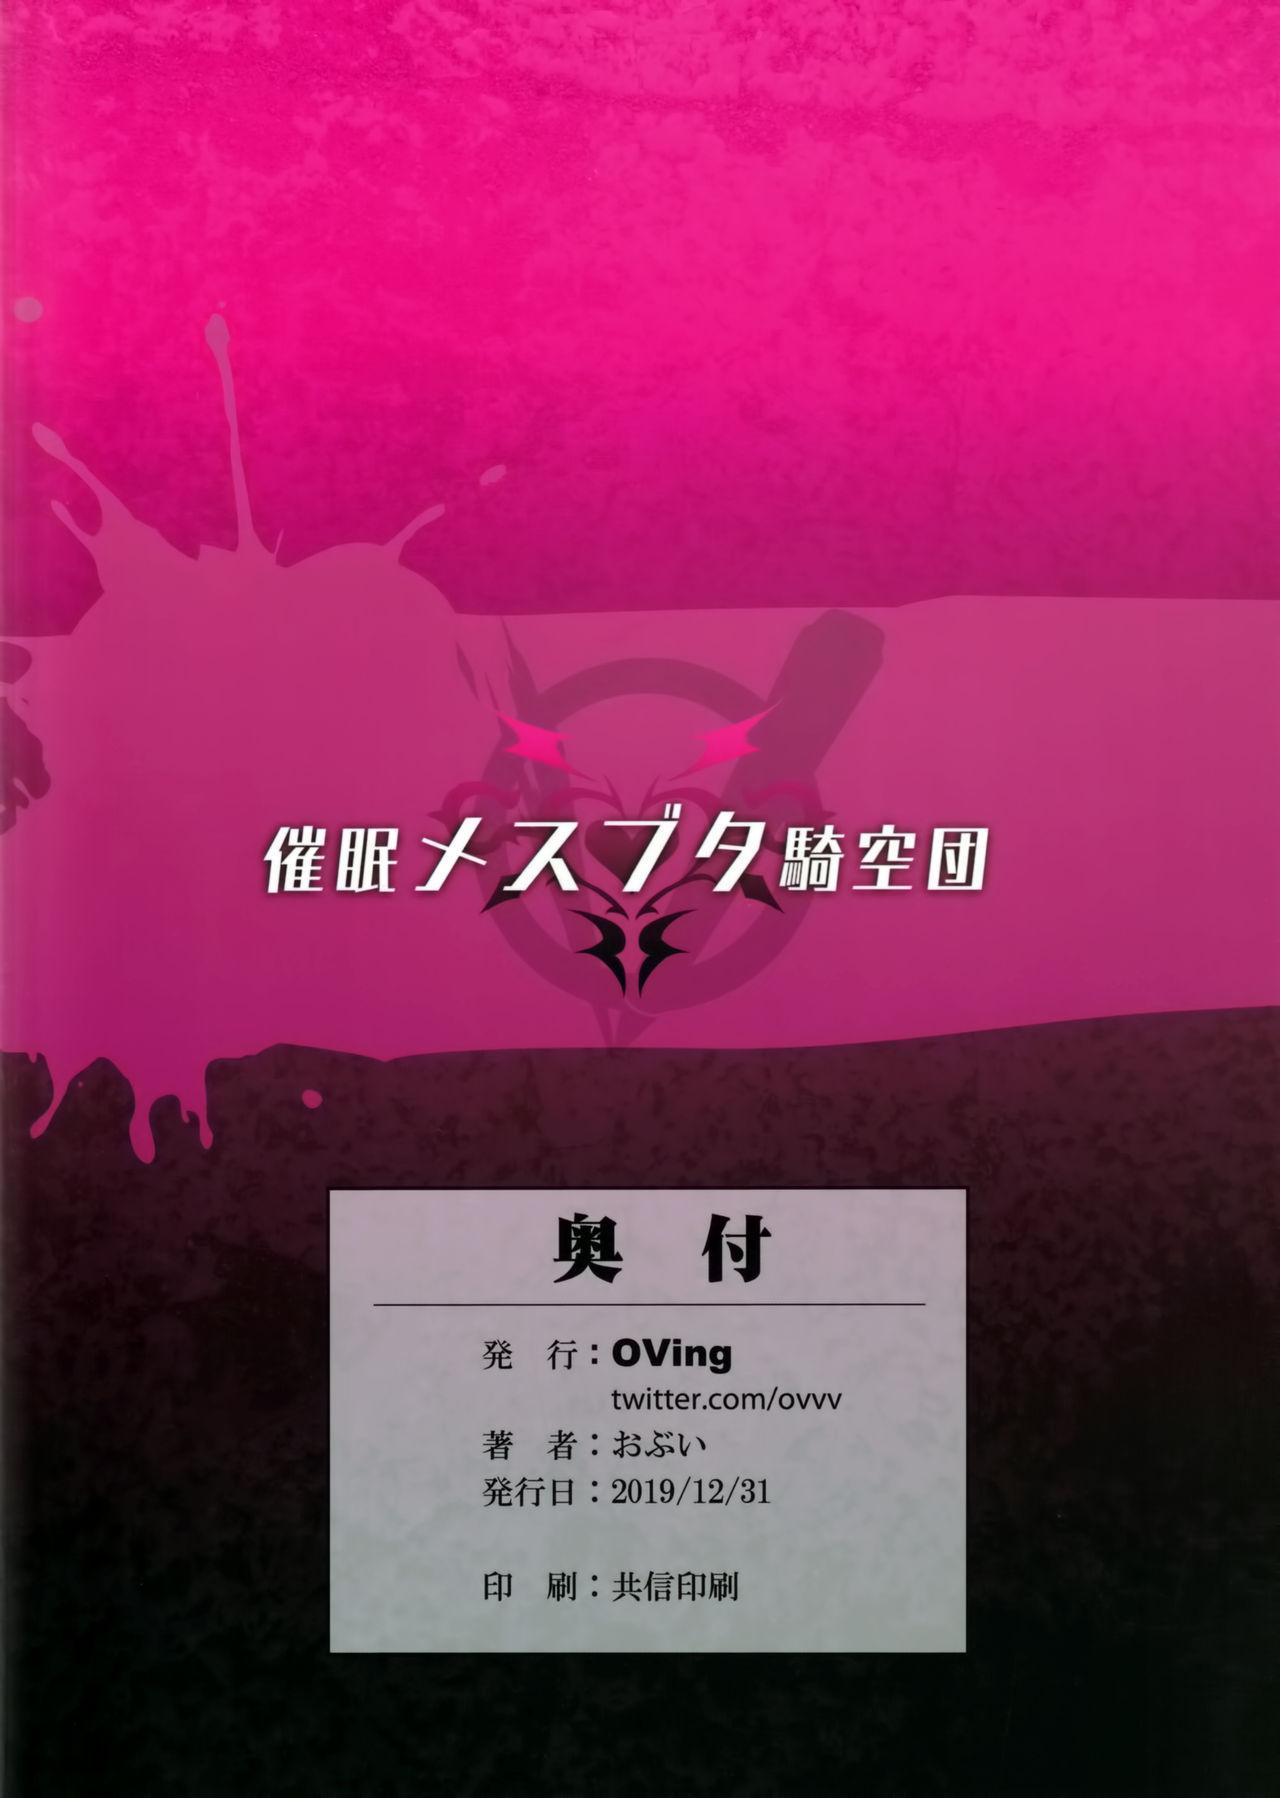 Saimin Mesubuta Kikuudan | Pig Sow Crew Hypnosis 41